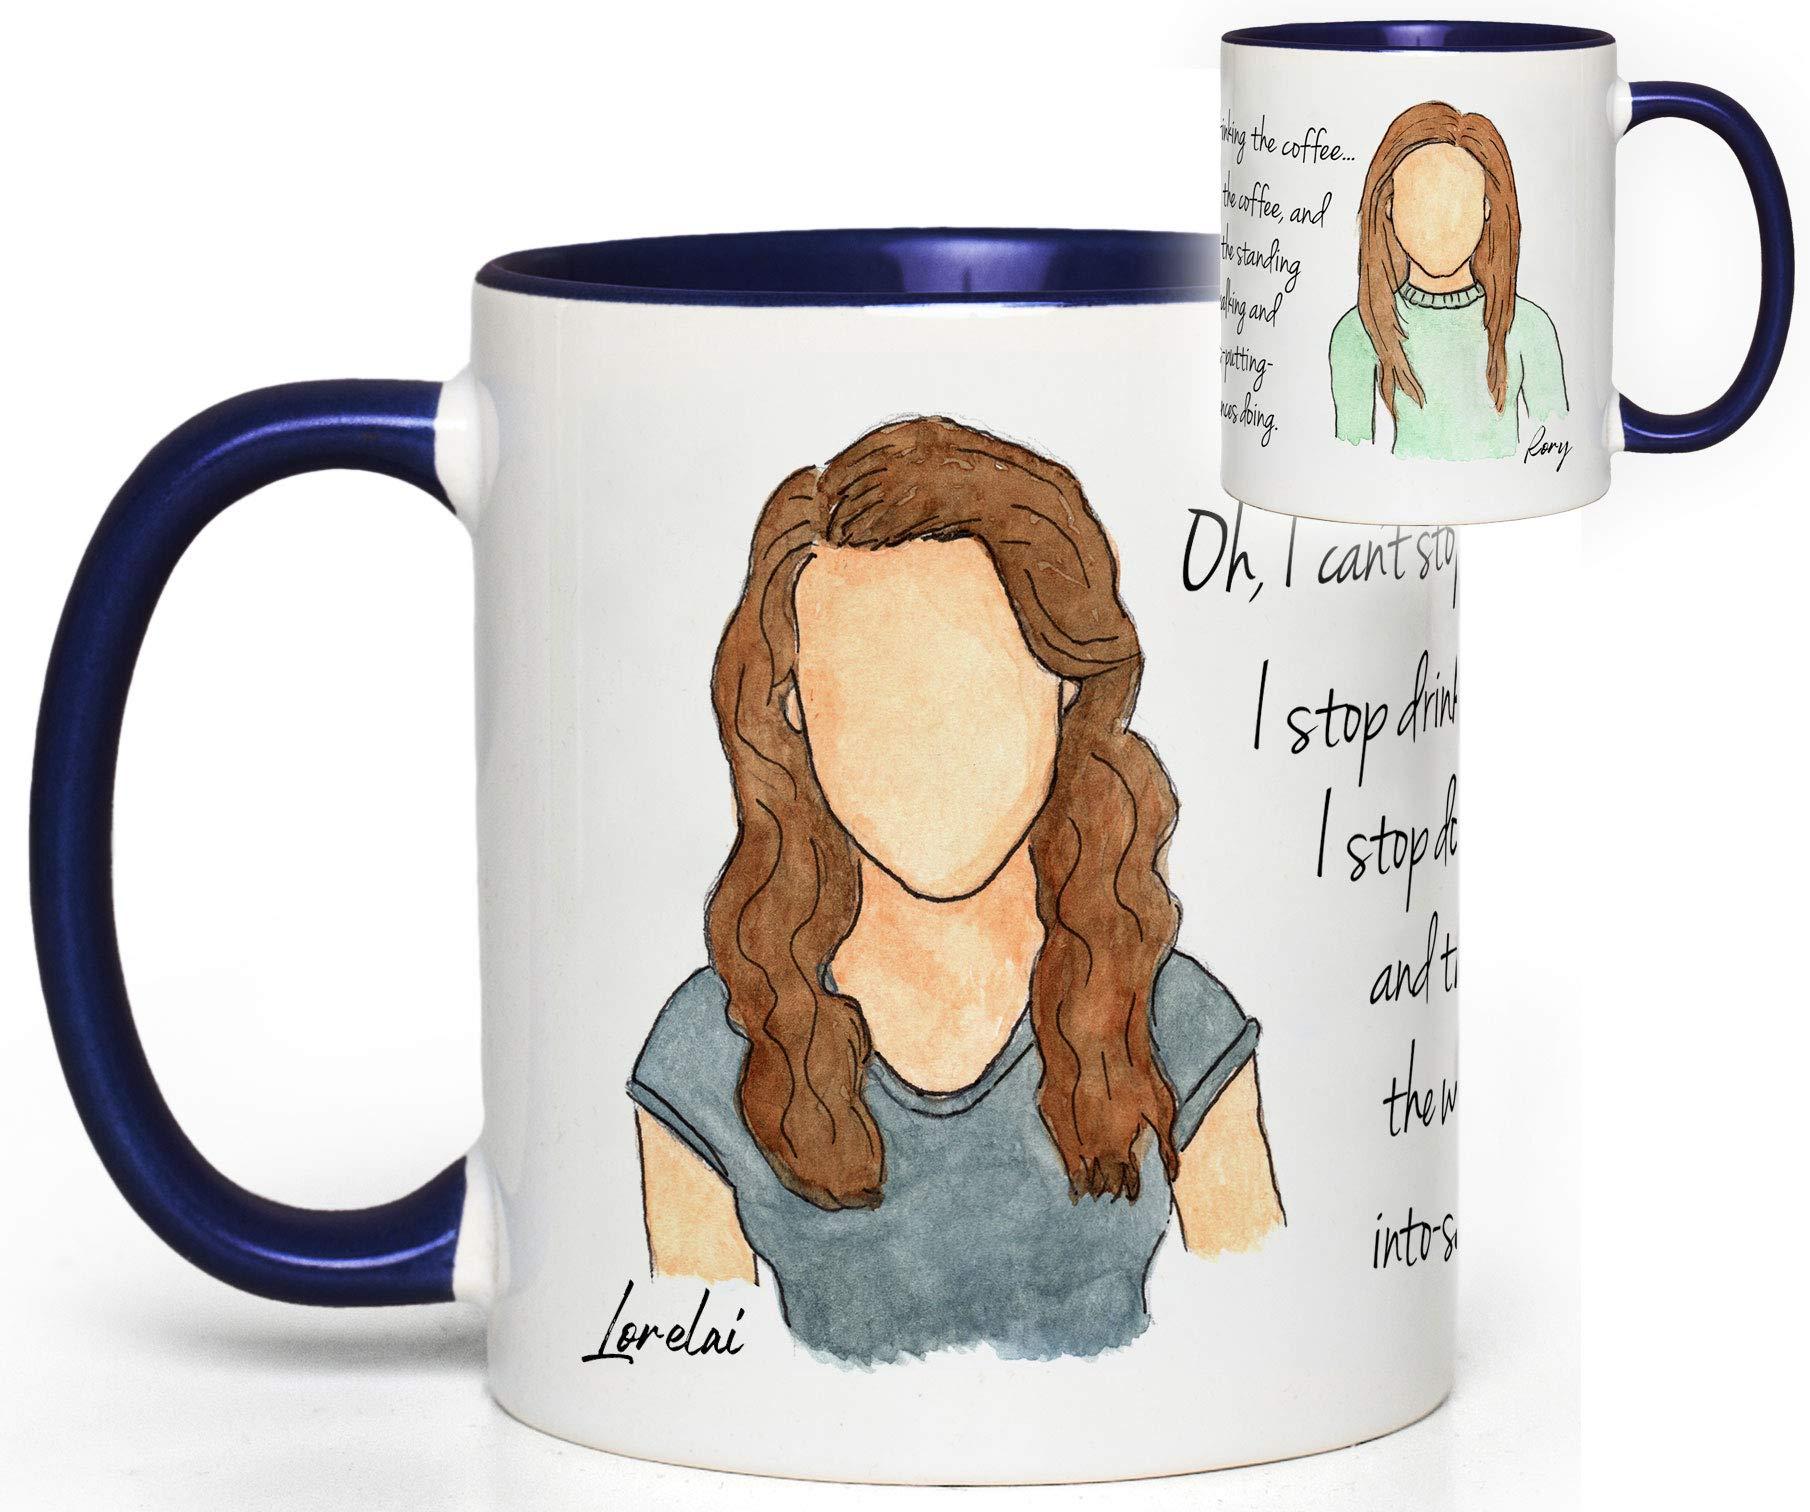 Gilmore Girls (Rory & Lorelai) TV Quote Mug Fan Gift